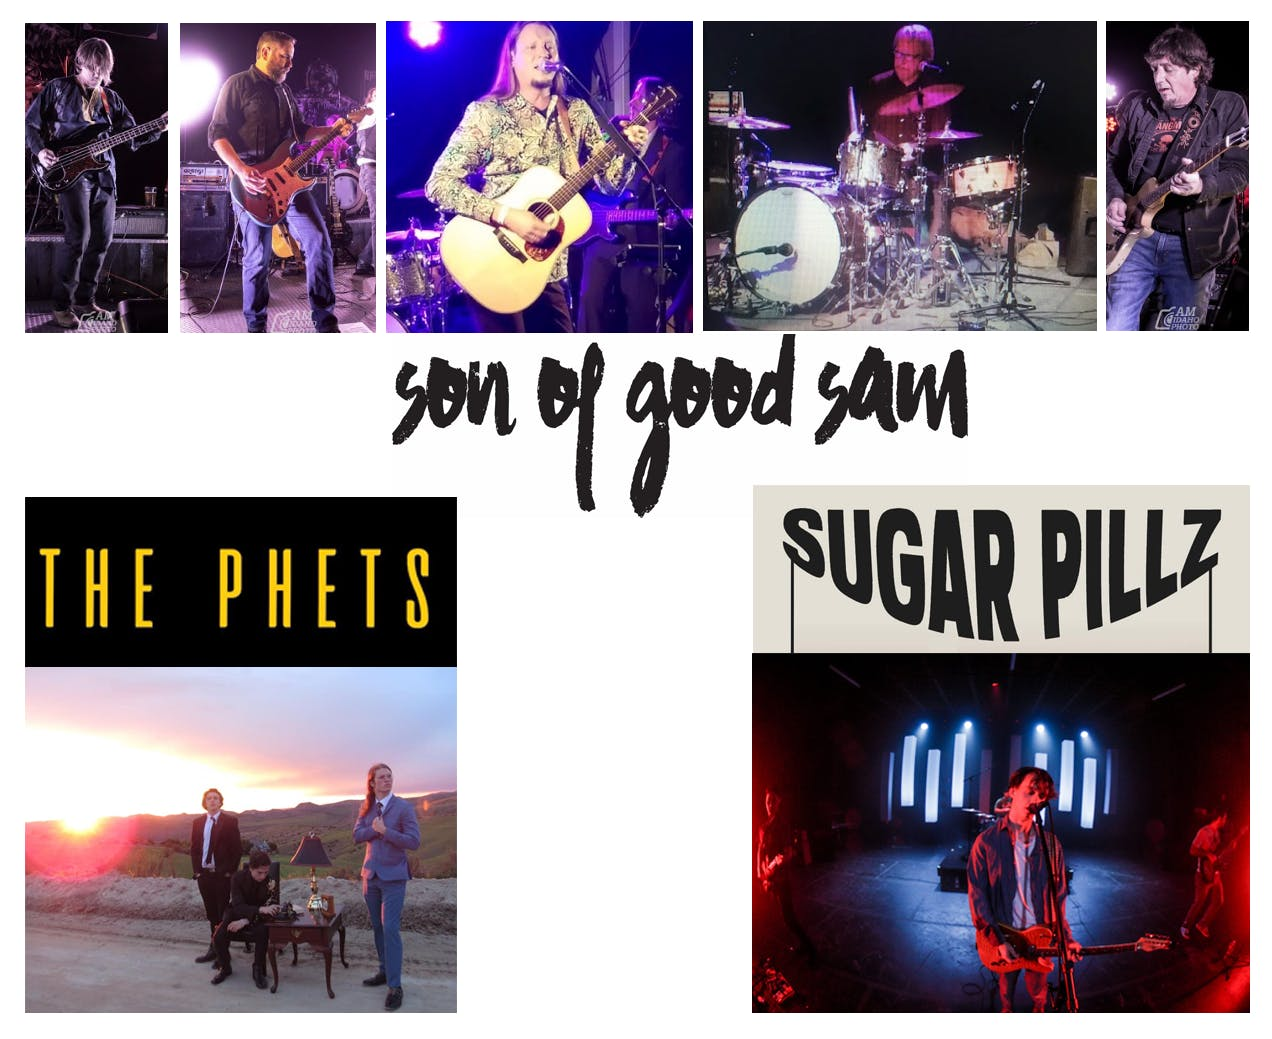 Son of Good Sam - The Phets - SugarPillz